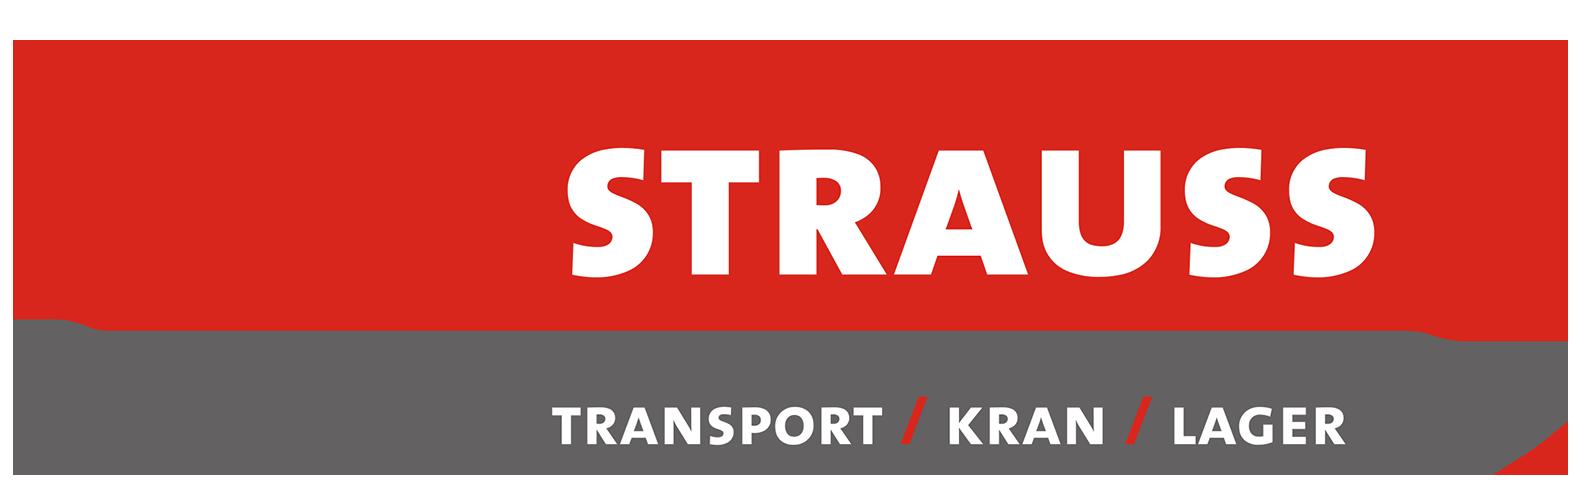 01_Strauss